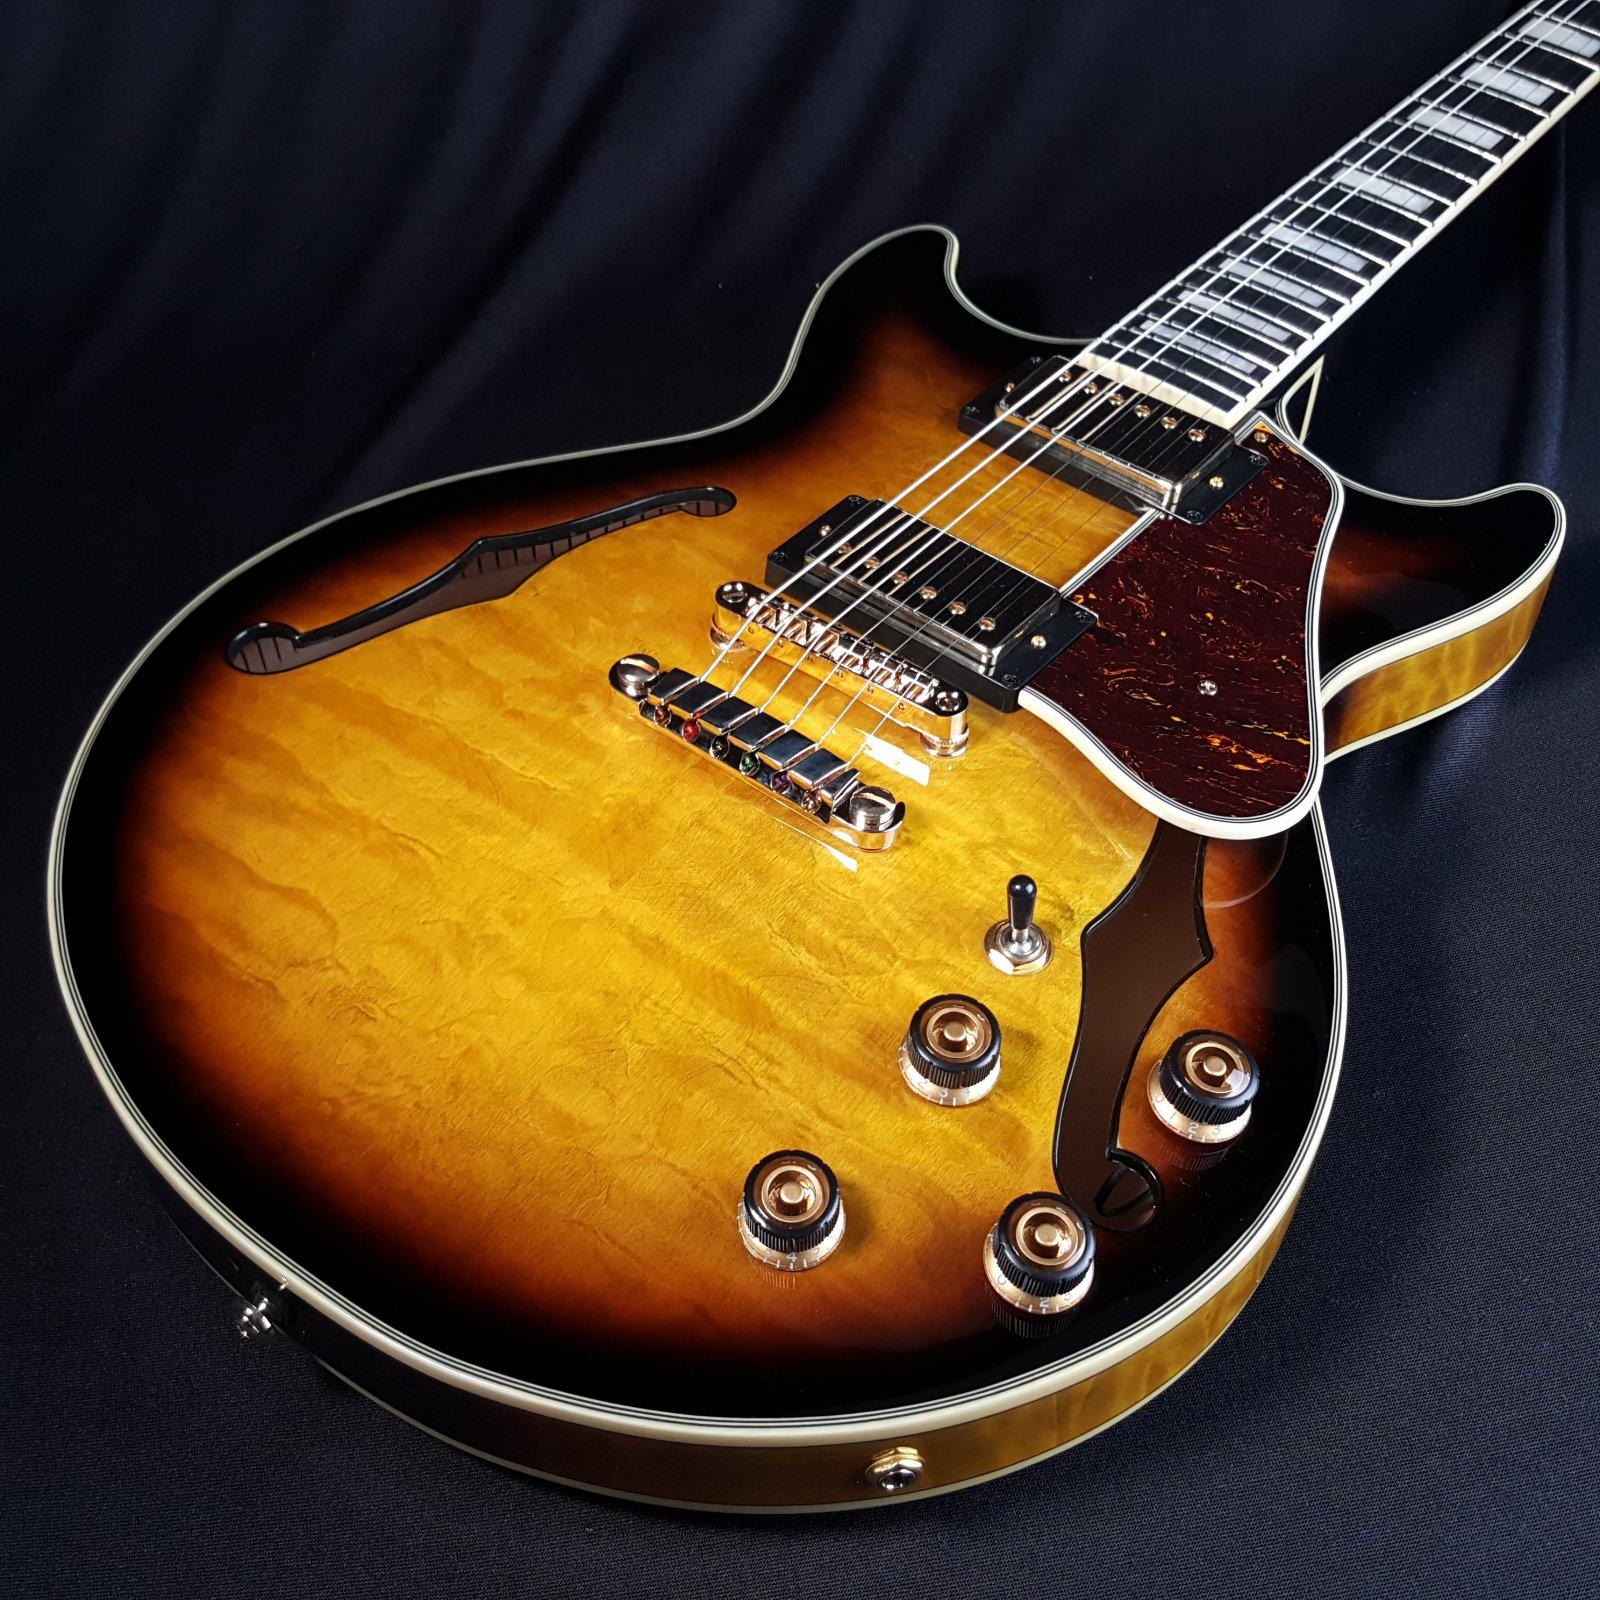 Ibanez Artcore Expressionist AM93QM  Antique Yellow Sunburst Semi-Hollow Electric Guitar